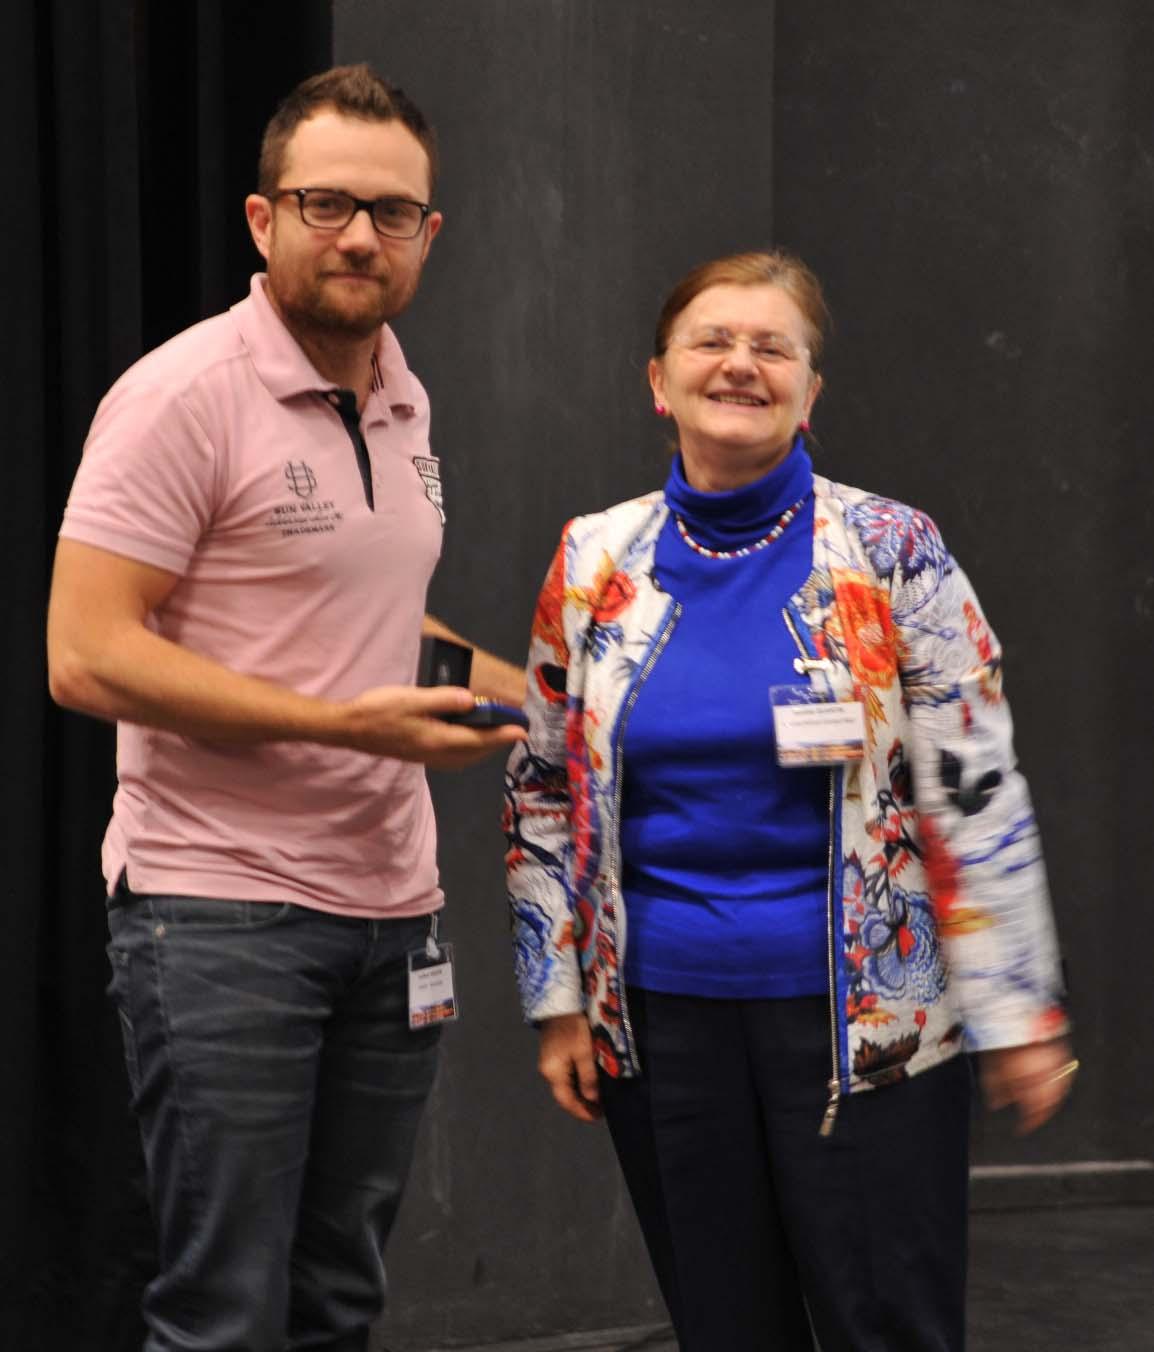 G. Martin (SIMaP) Médaille Jean Rist 2017